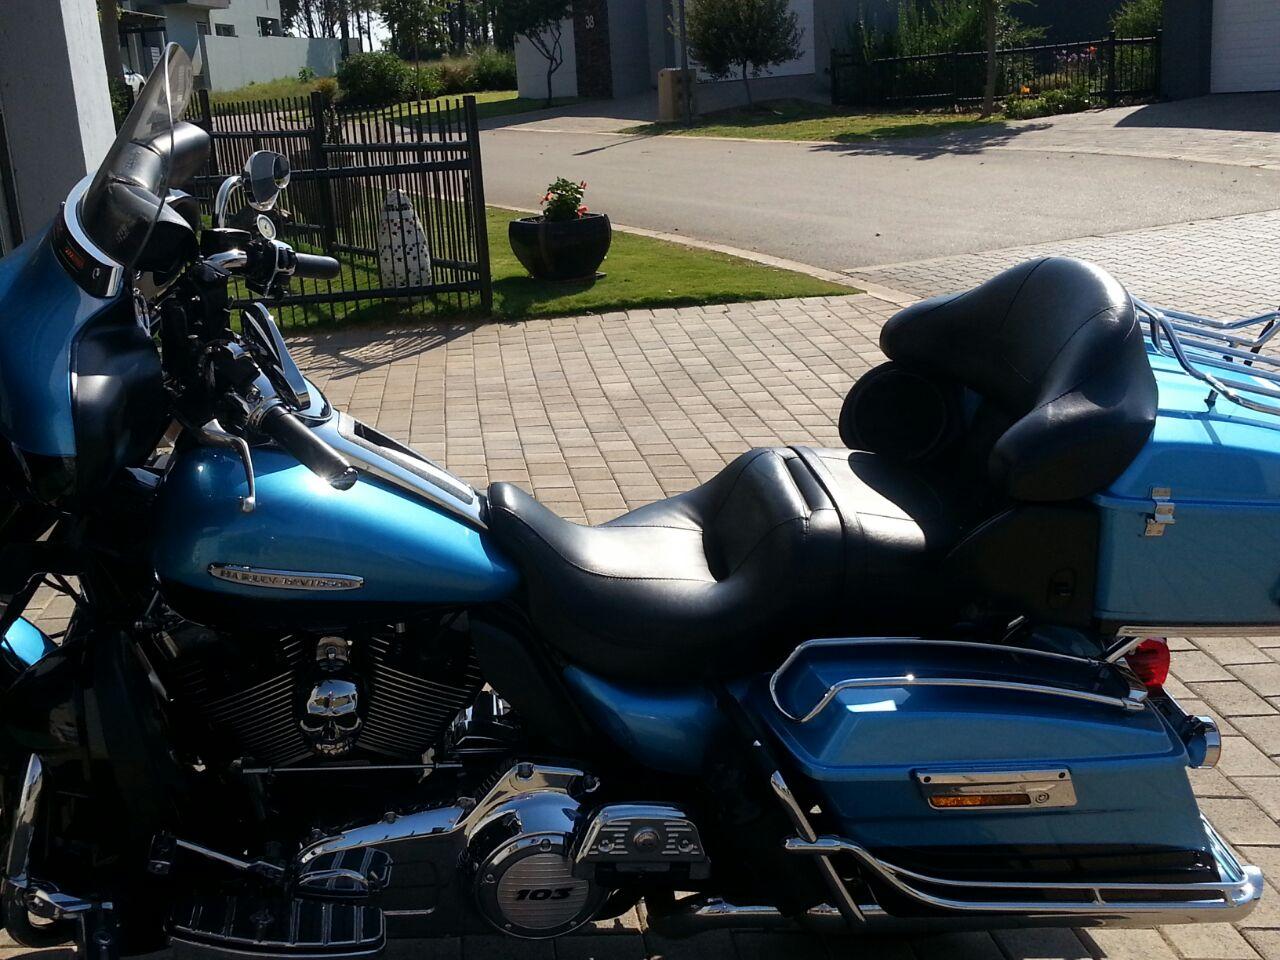 2011 Harley Davidson Ultra Glide